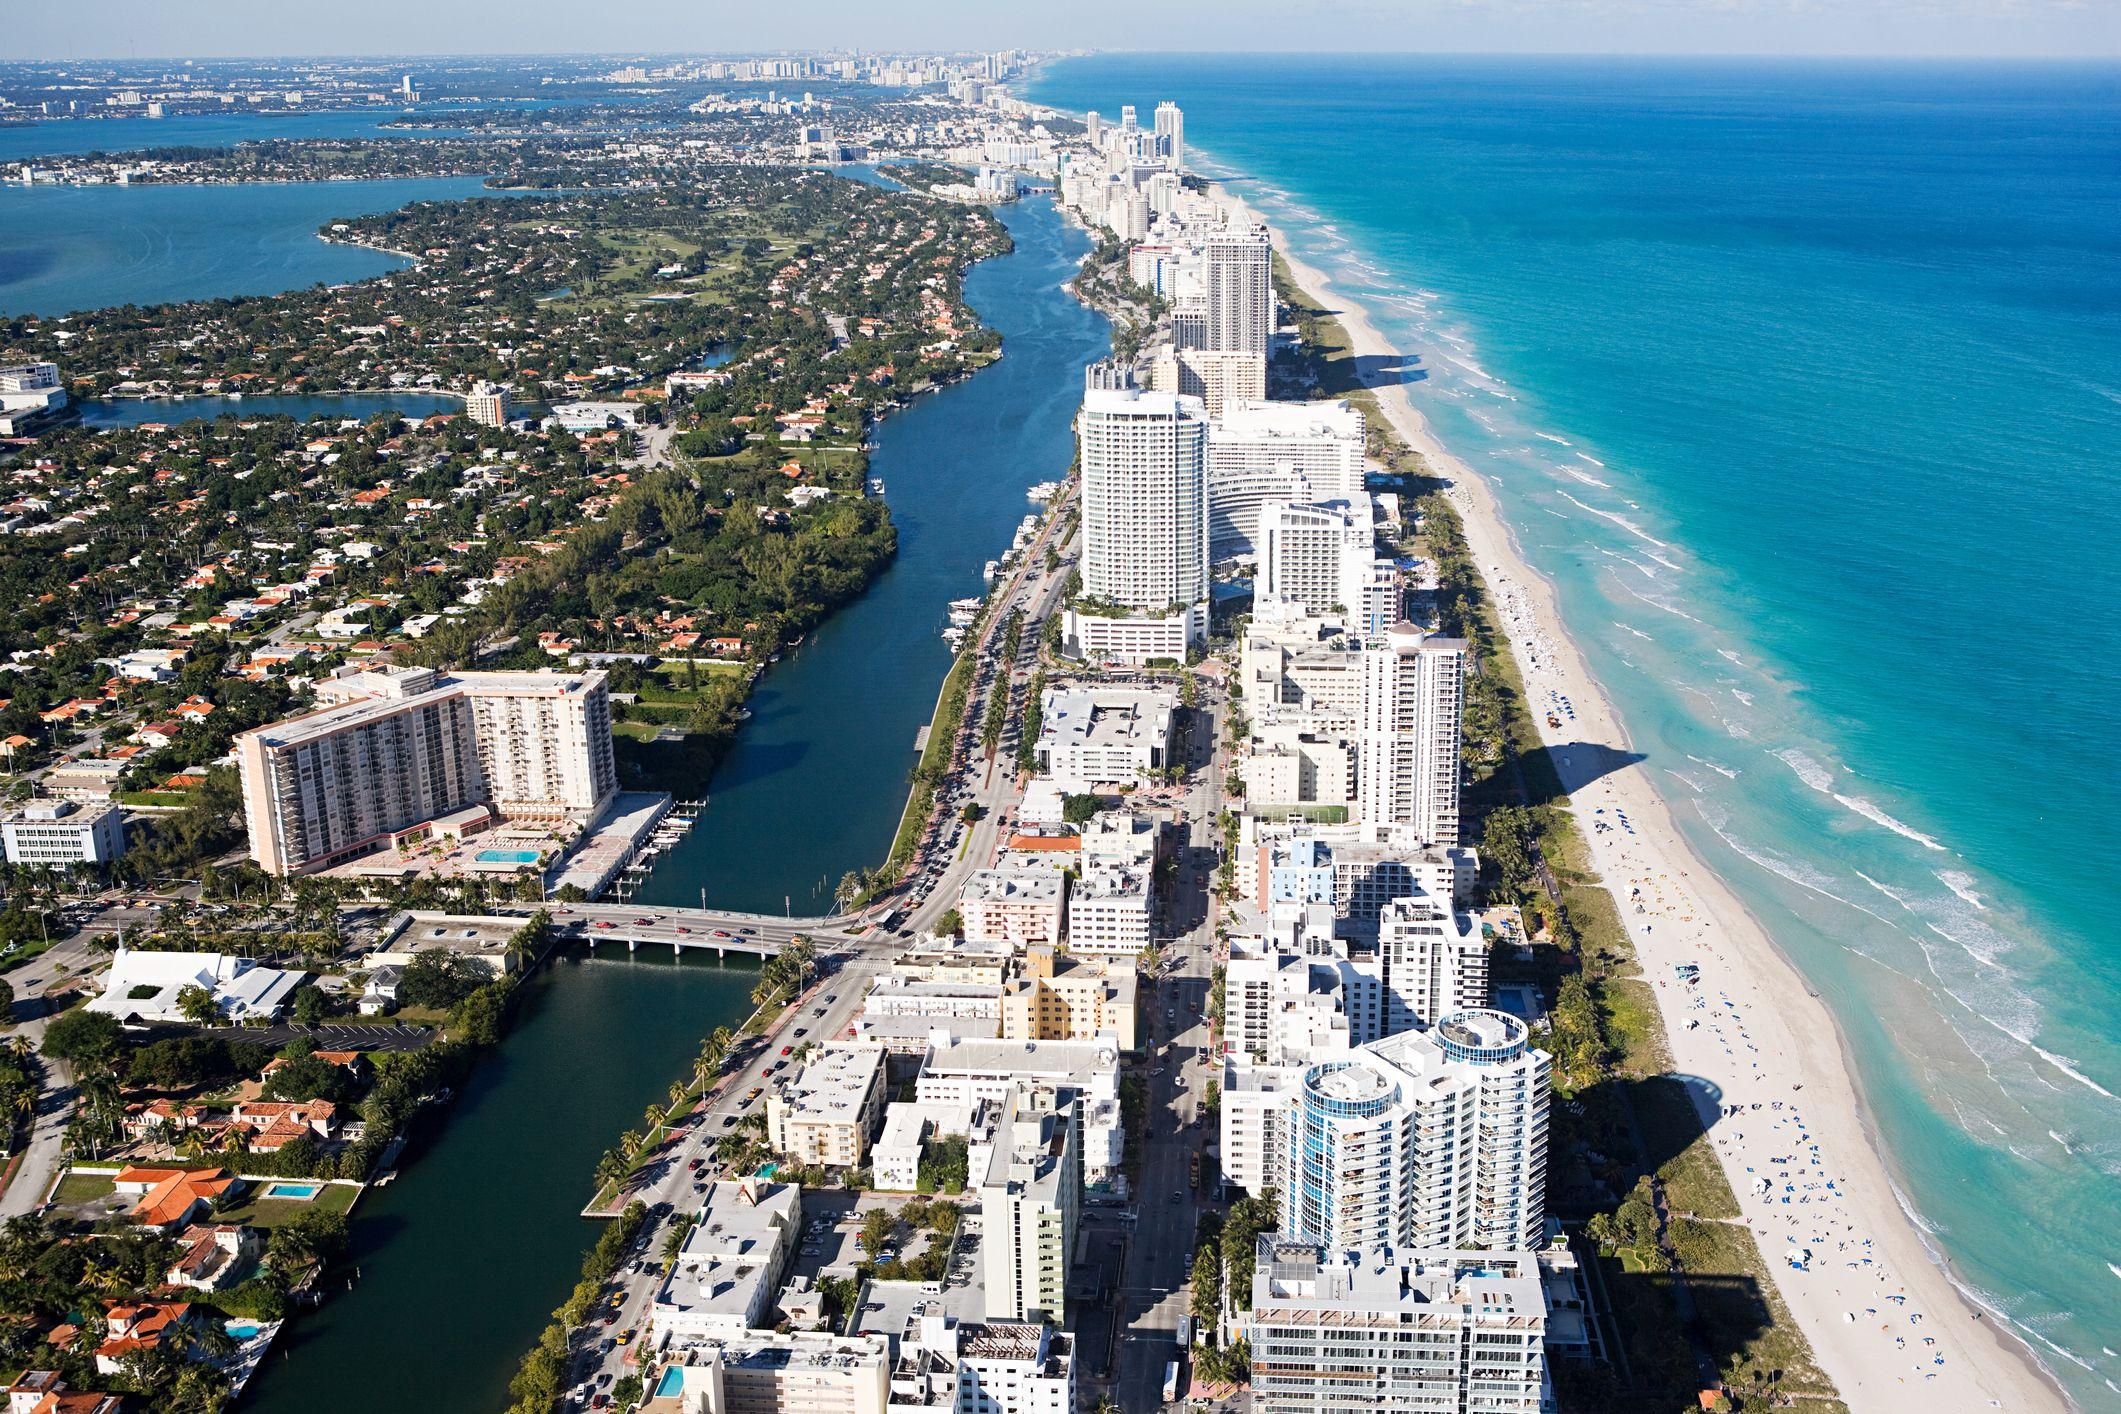 A Brief Explanation of the Miami Dade Government